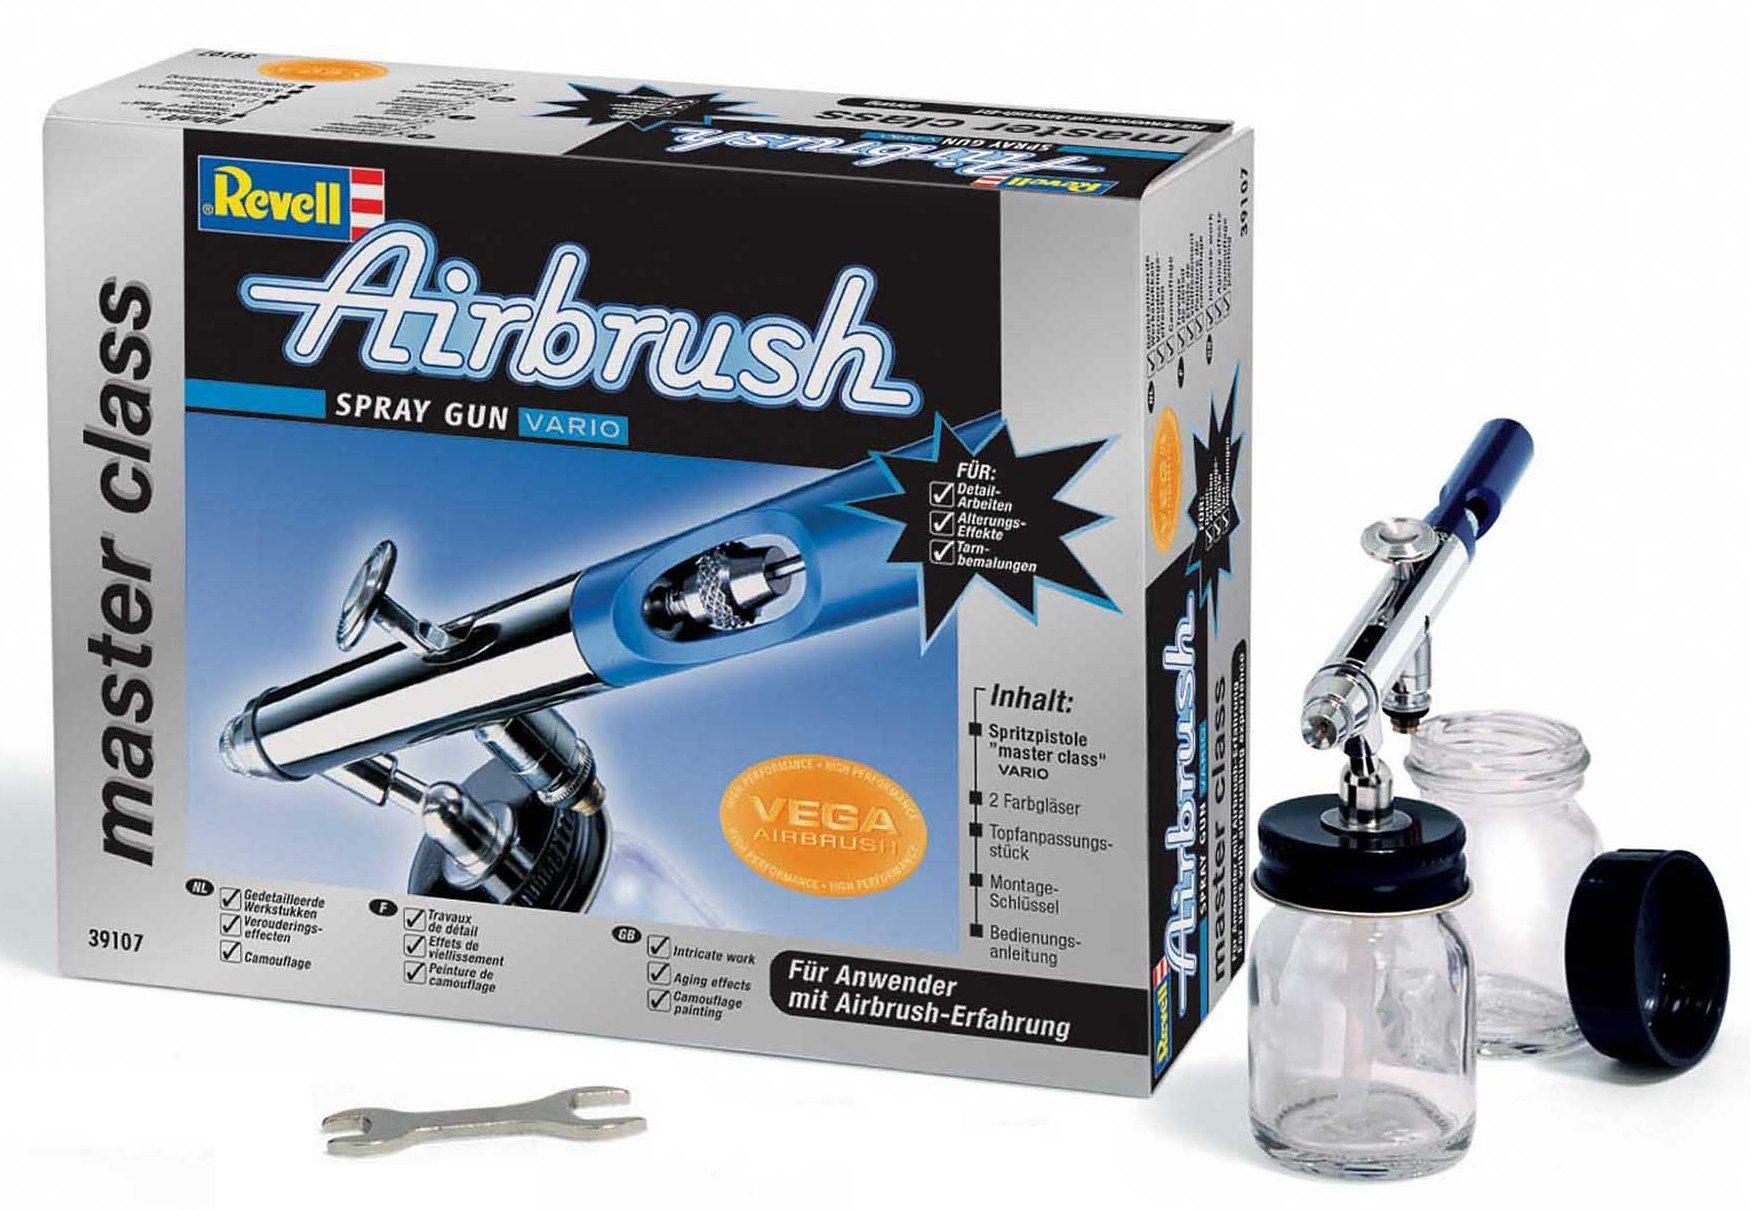 Revell® Airbrush-Pistole,  Spray Gun master class Vario  Preisvergleich